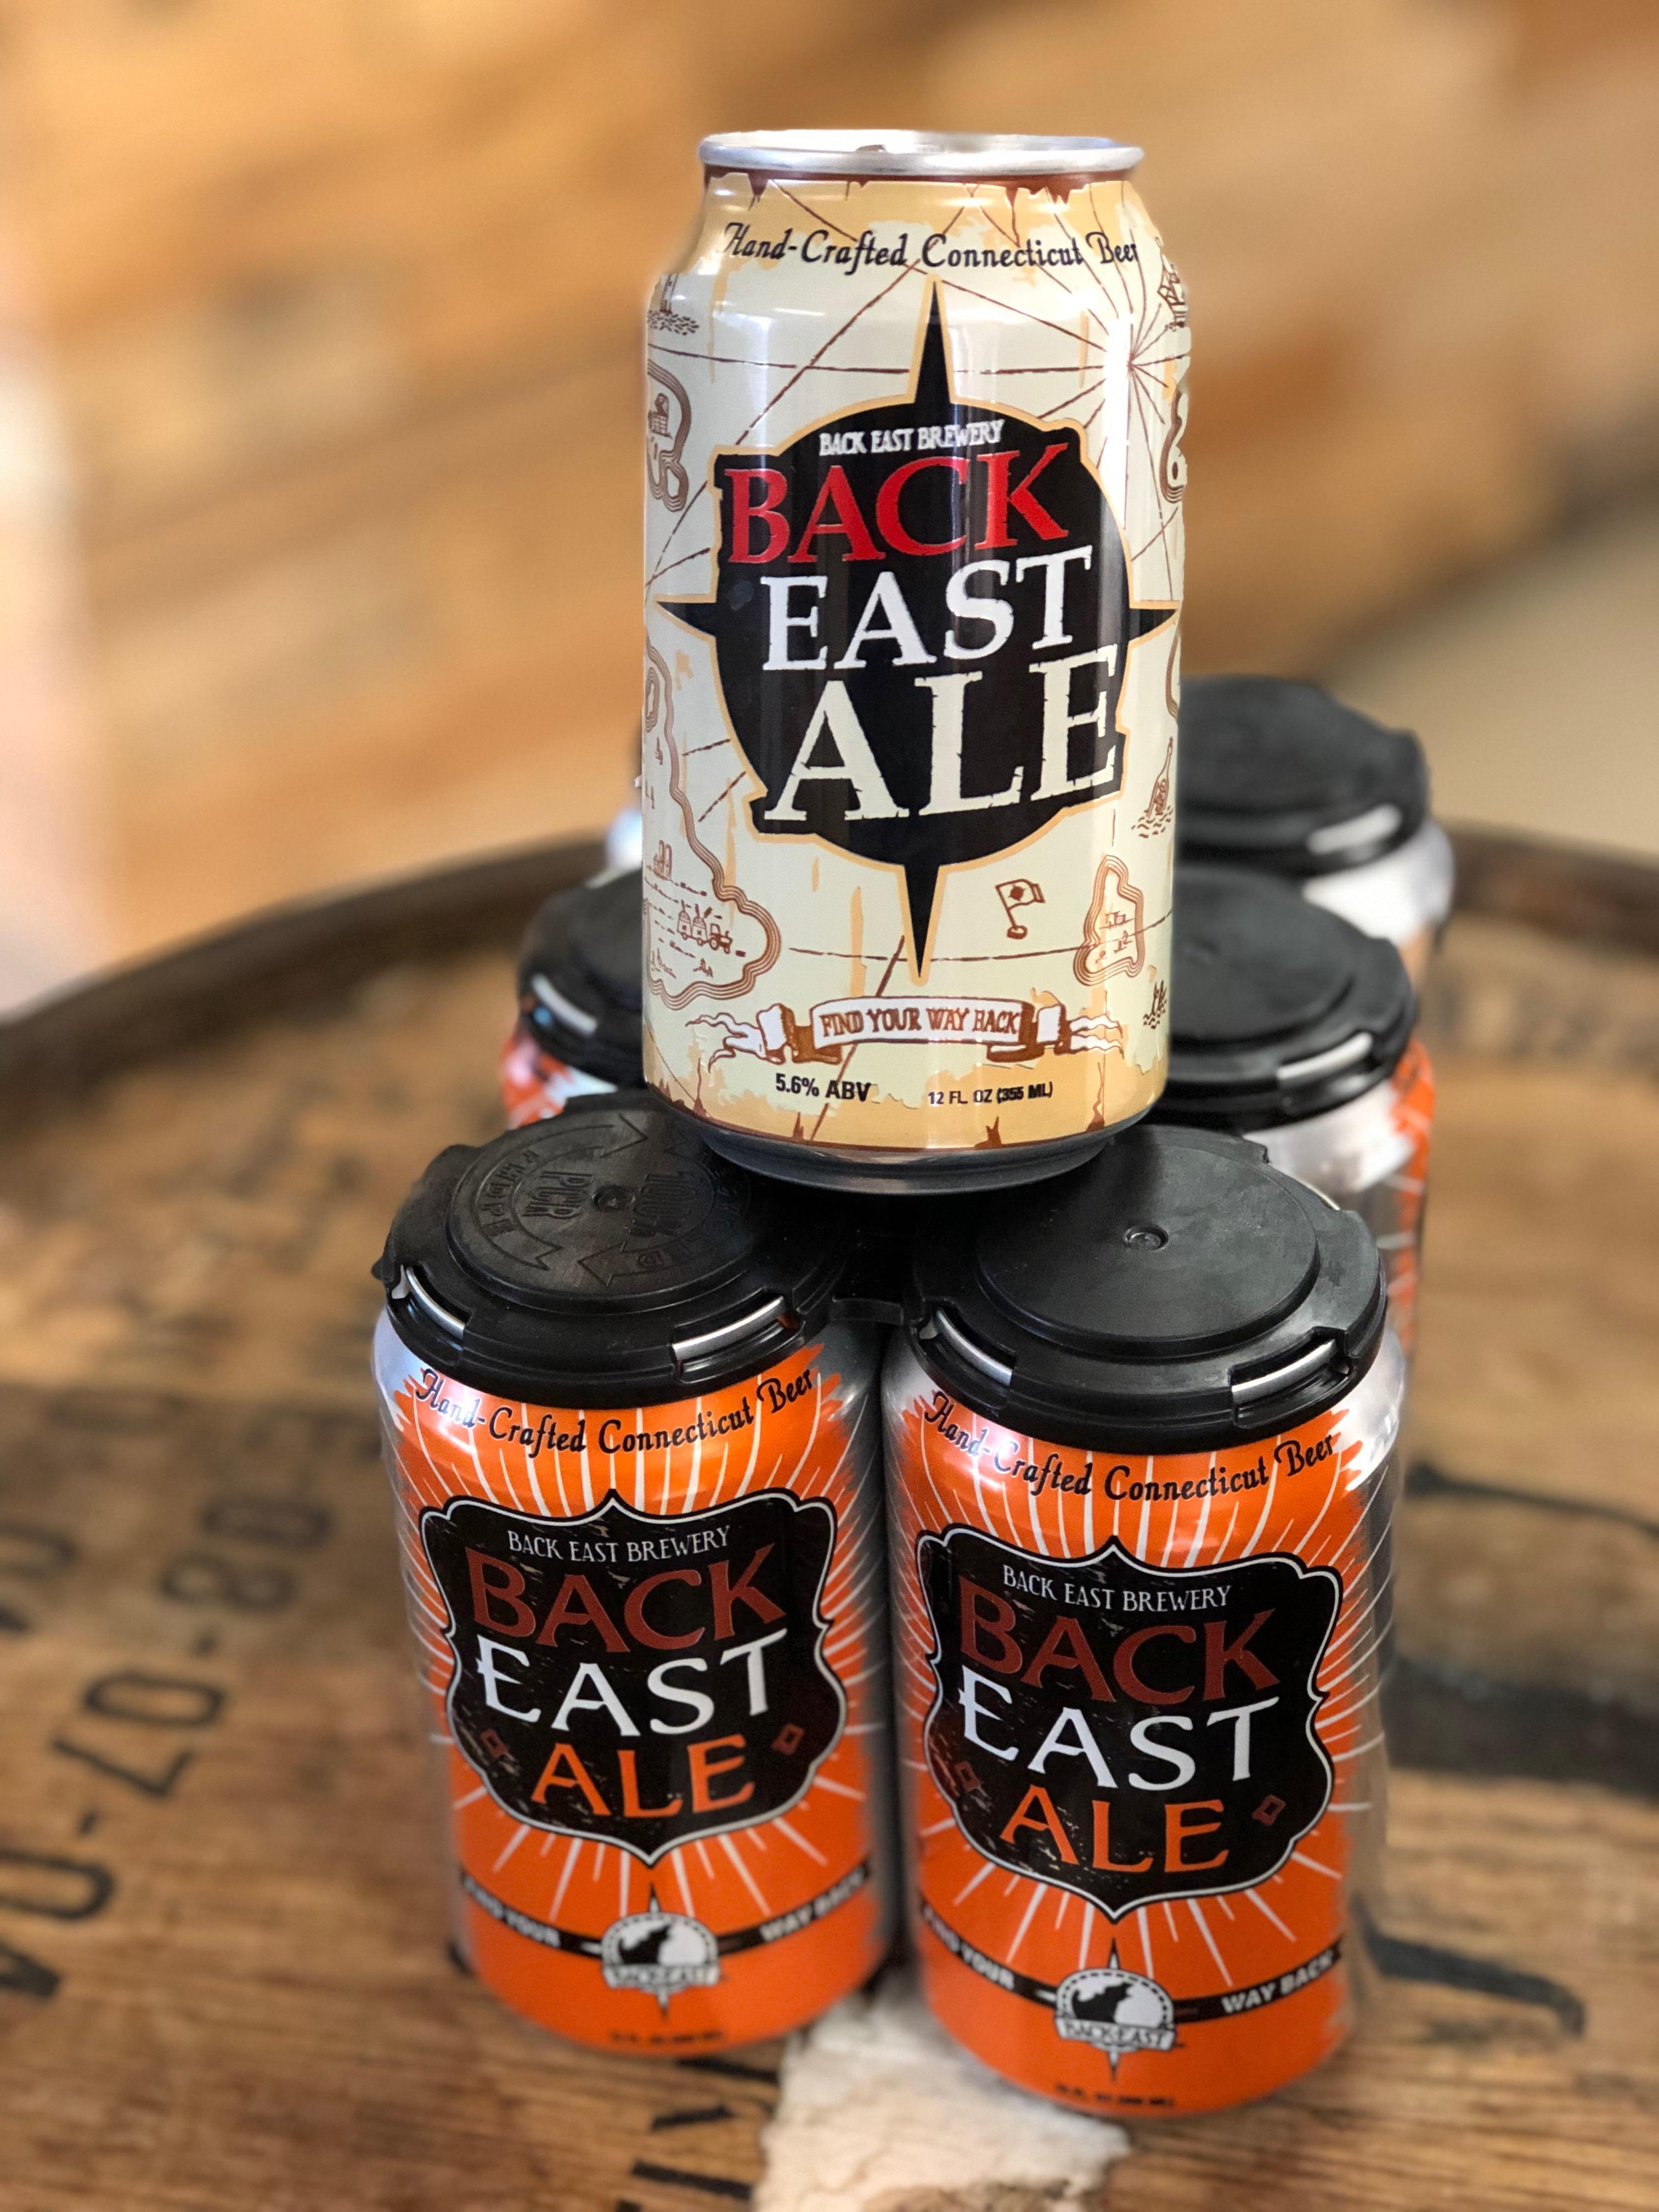 Back East Ale